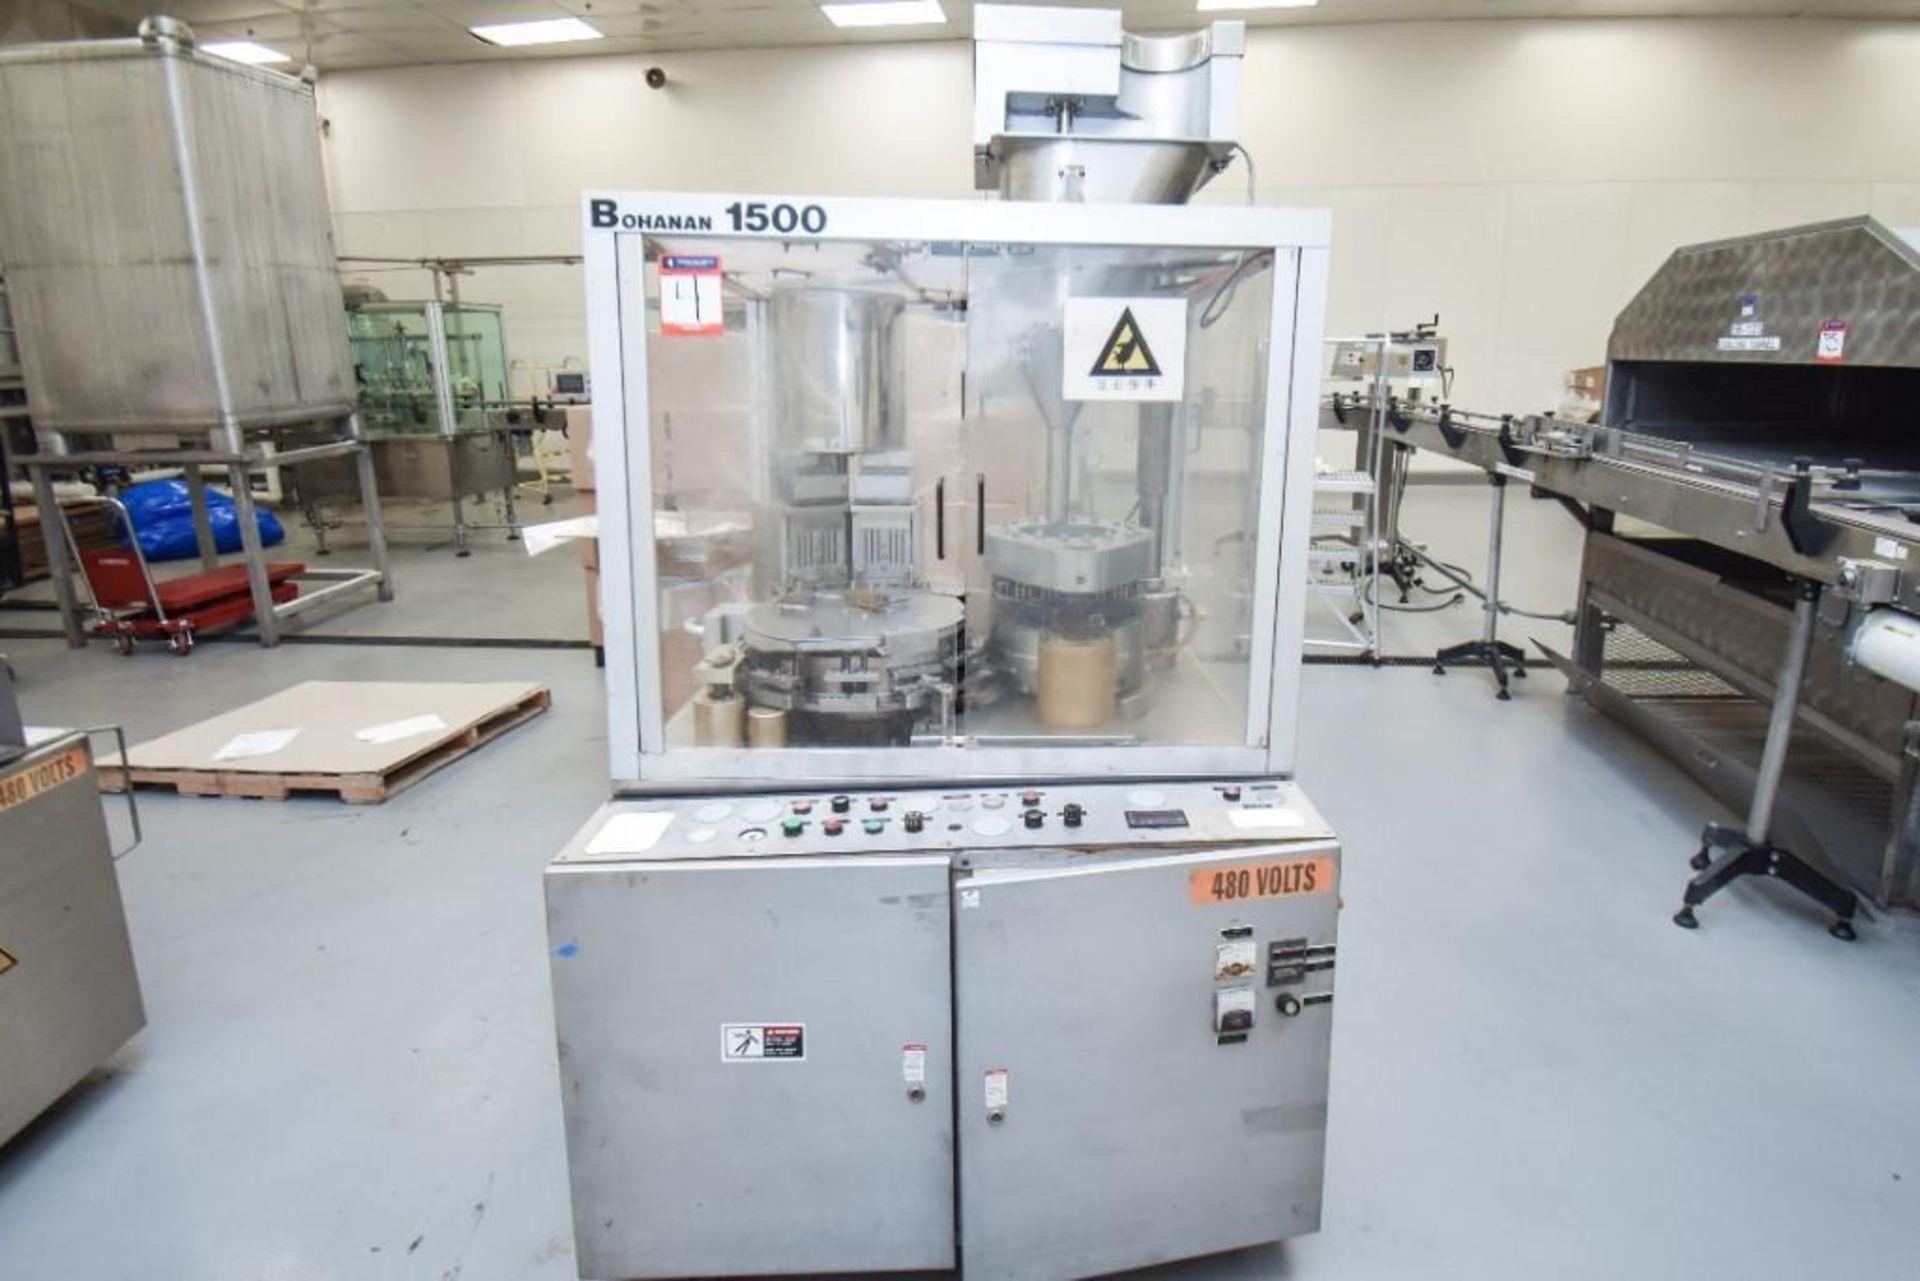 Bohanan 1500 Encapsulation Machine